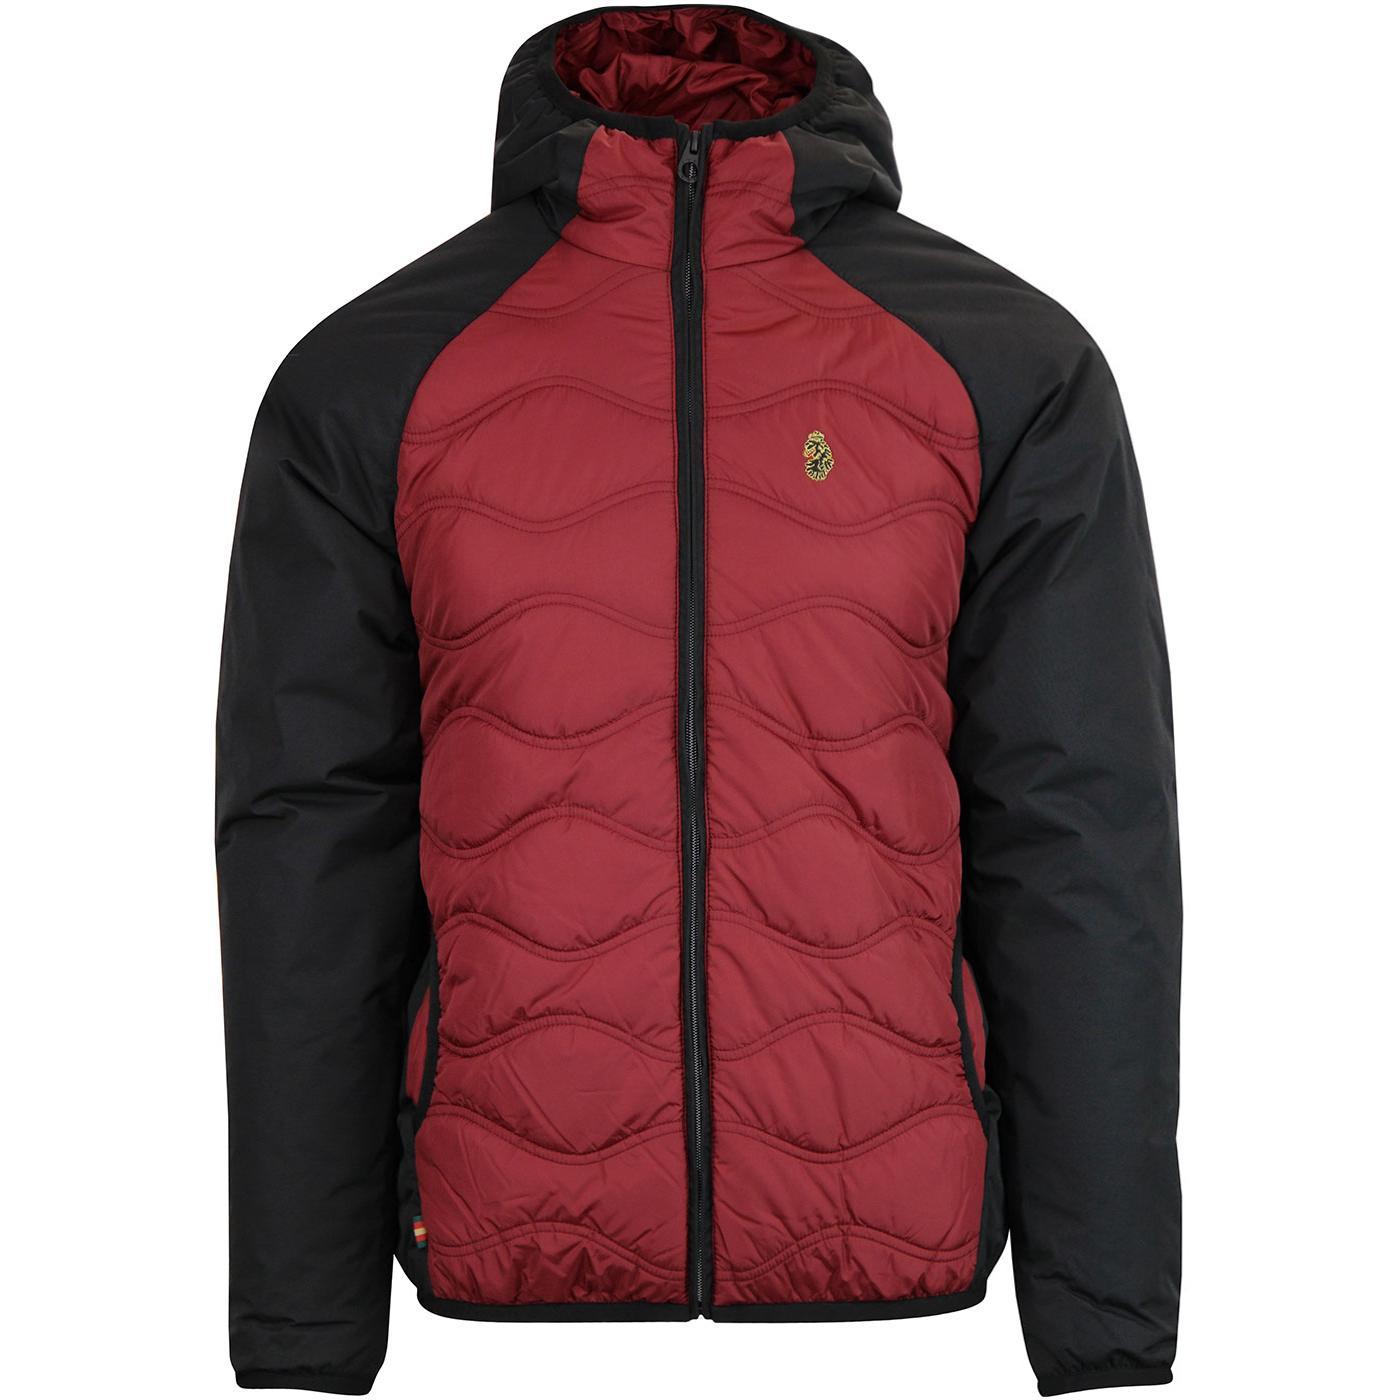 Roundy LUKE Retro Men's Quilted Ski Jacket (B/R)